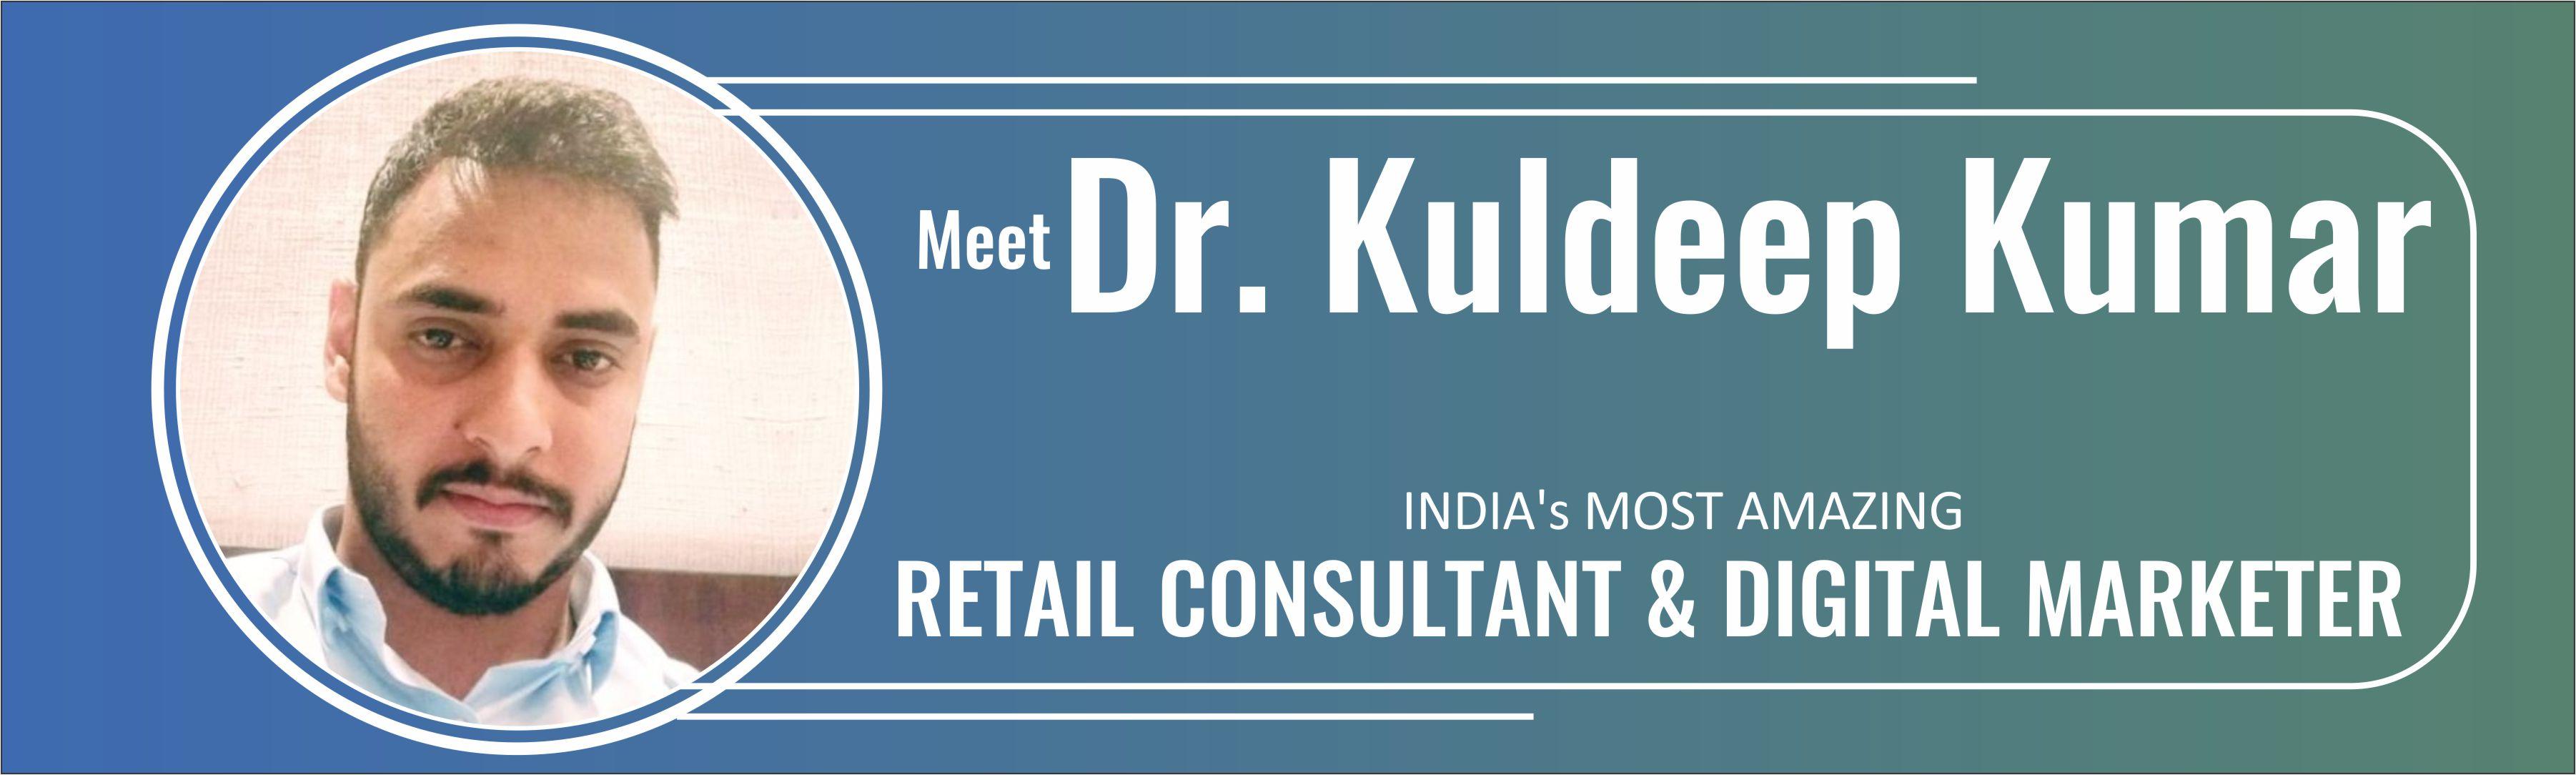 Meet India's Most Amazing Retail Consultant & Digital Marketer – Dr. Kuldeep Kumar 2.0